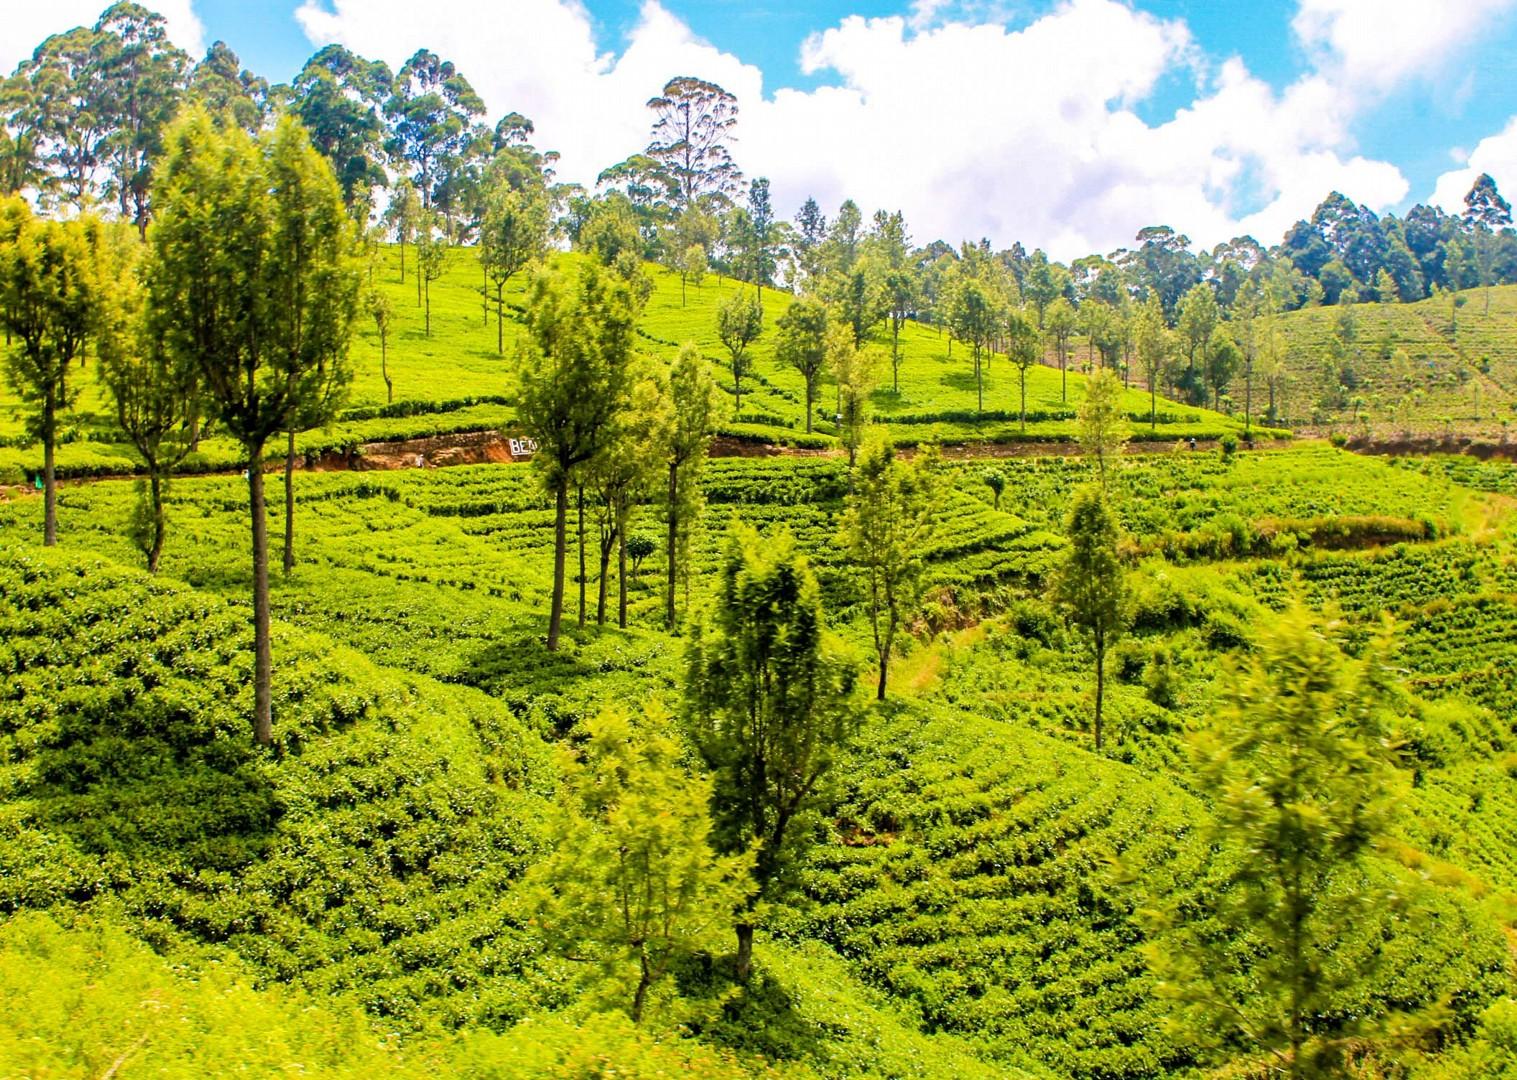 IMG_4869.jpg - Sri Lanka - Backroads and Beaches - Cycling Adventures